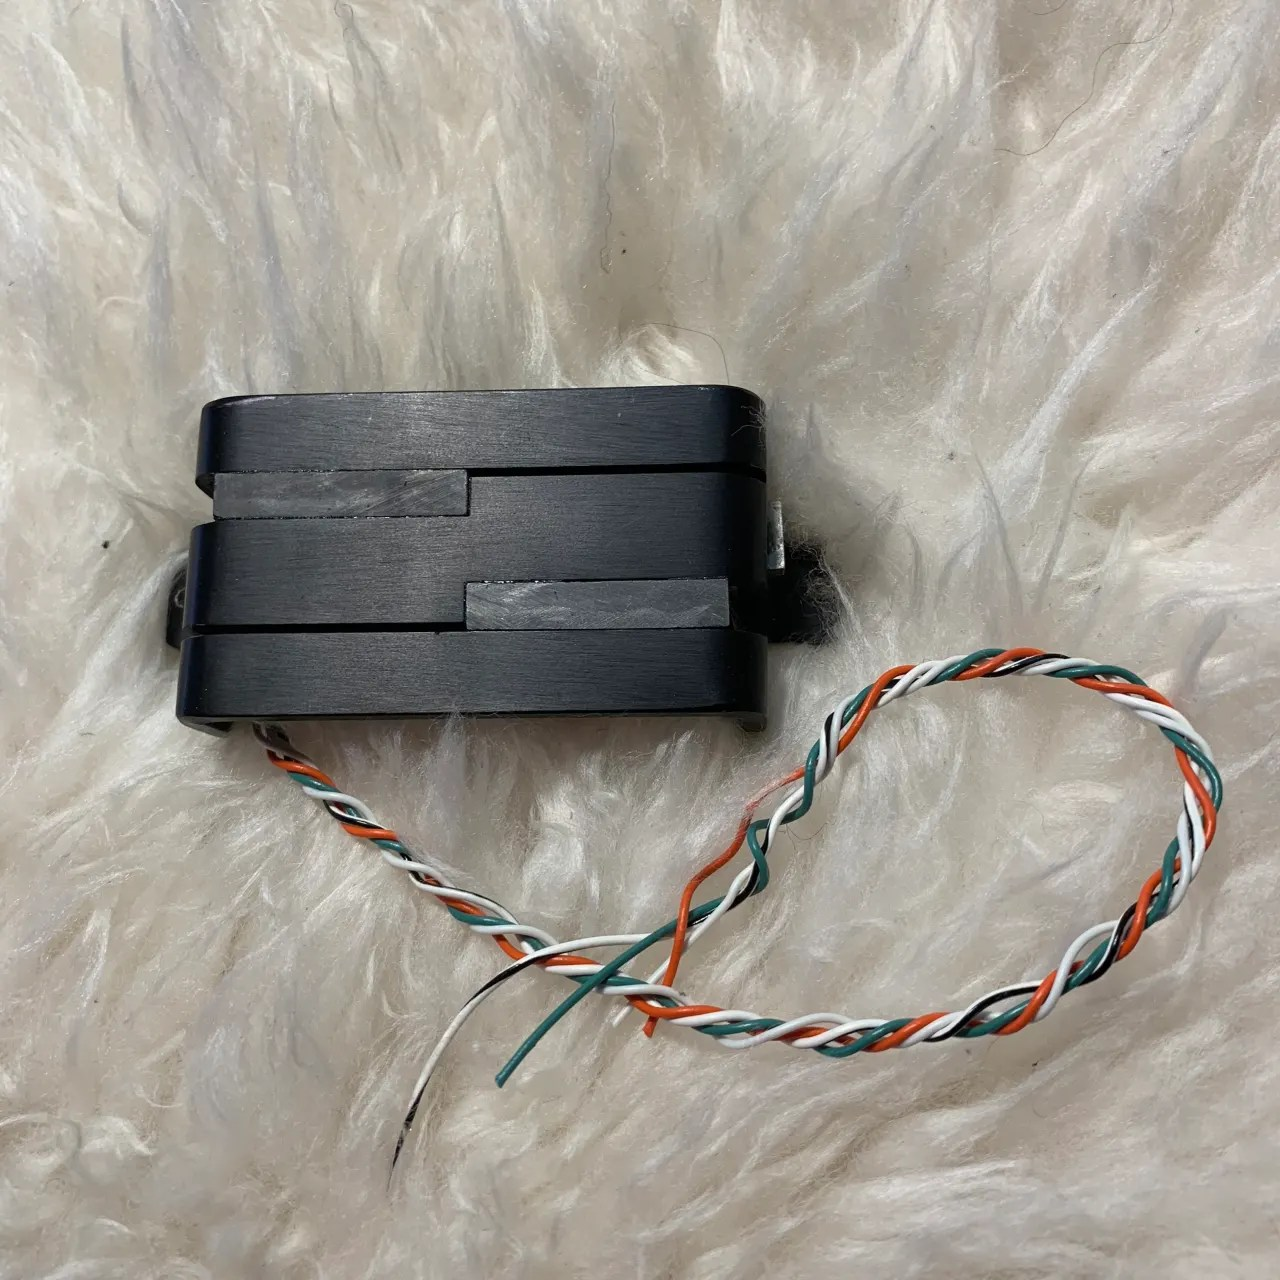 hight resolution of lace alumitone deathbucker wiring